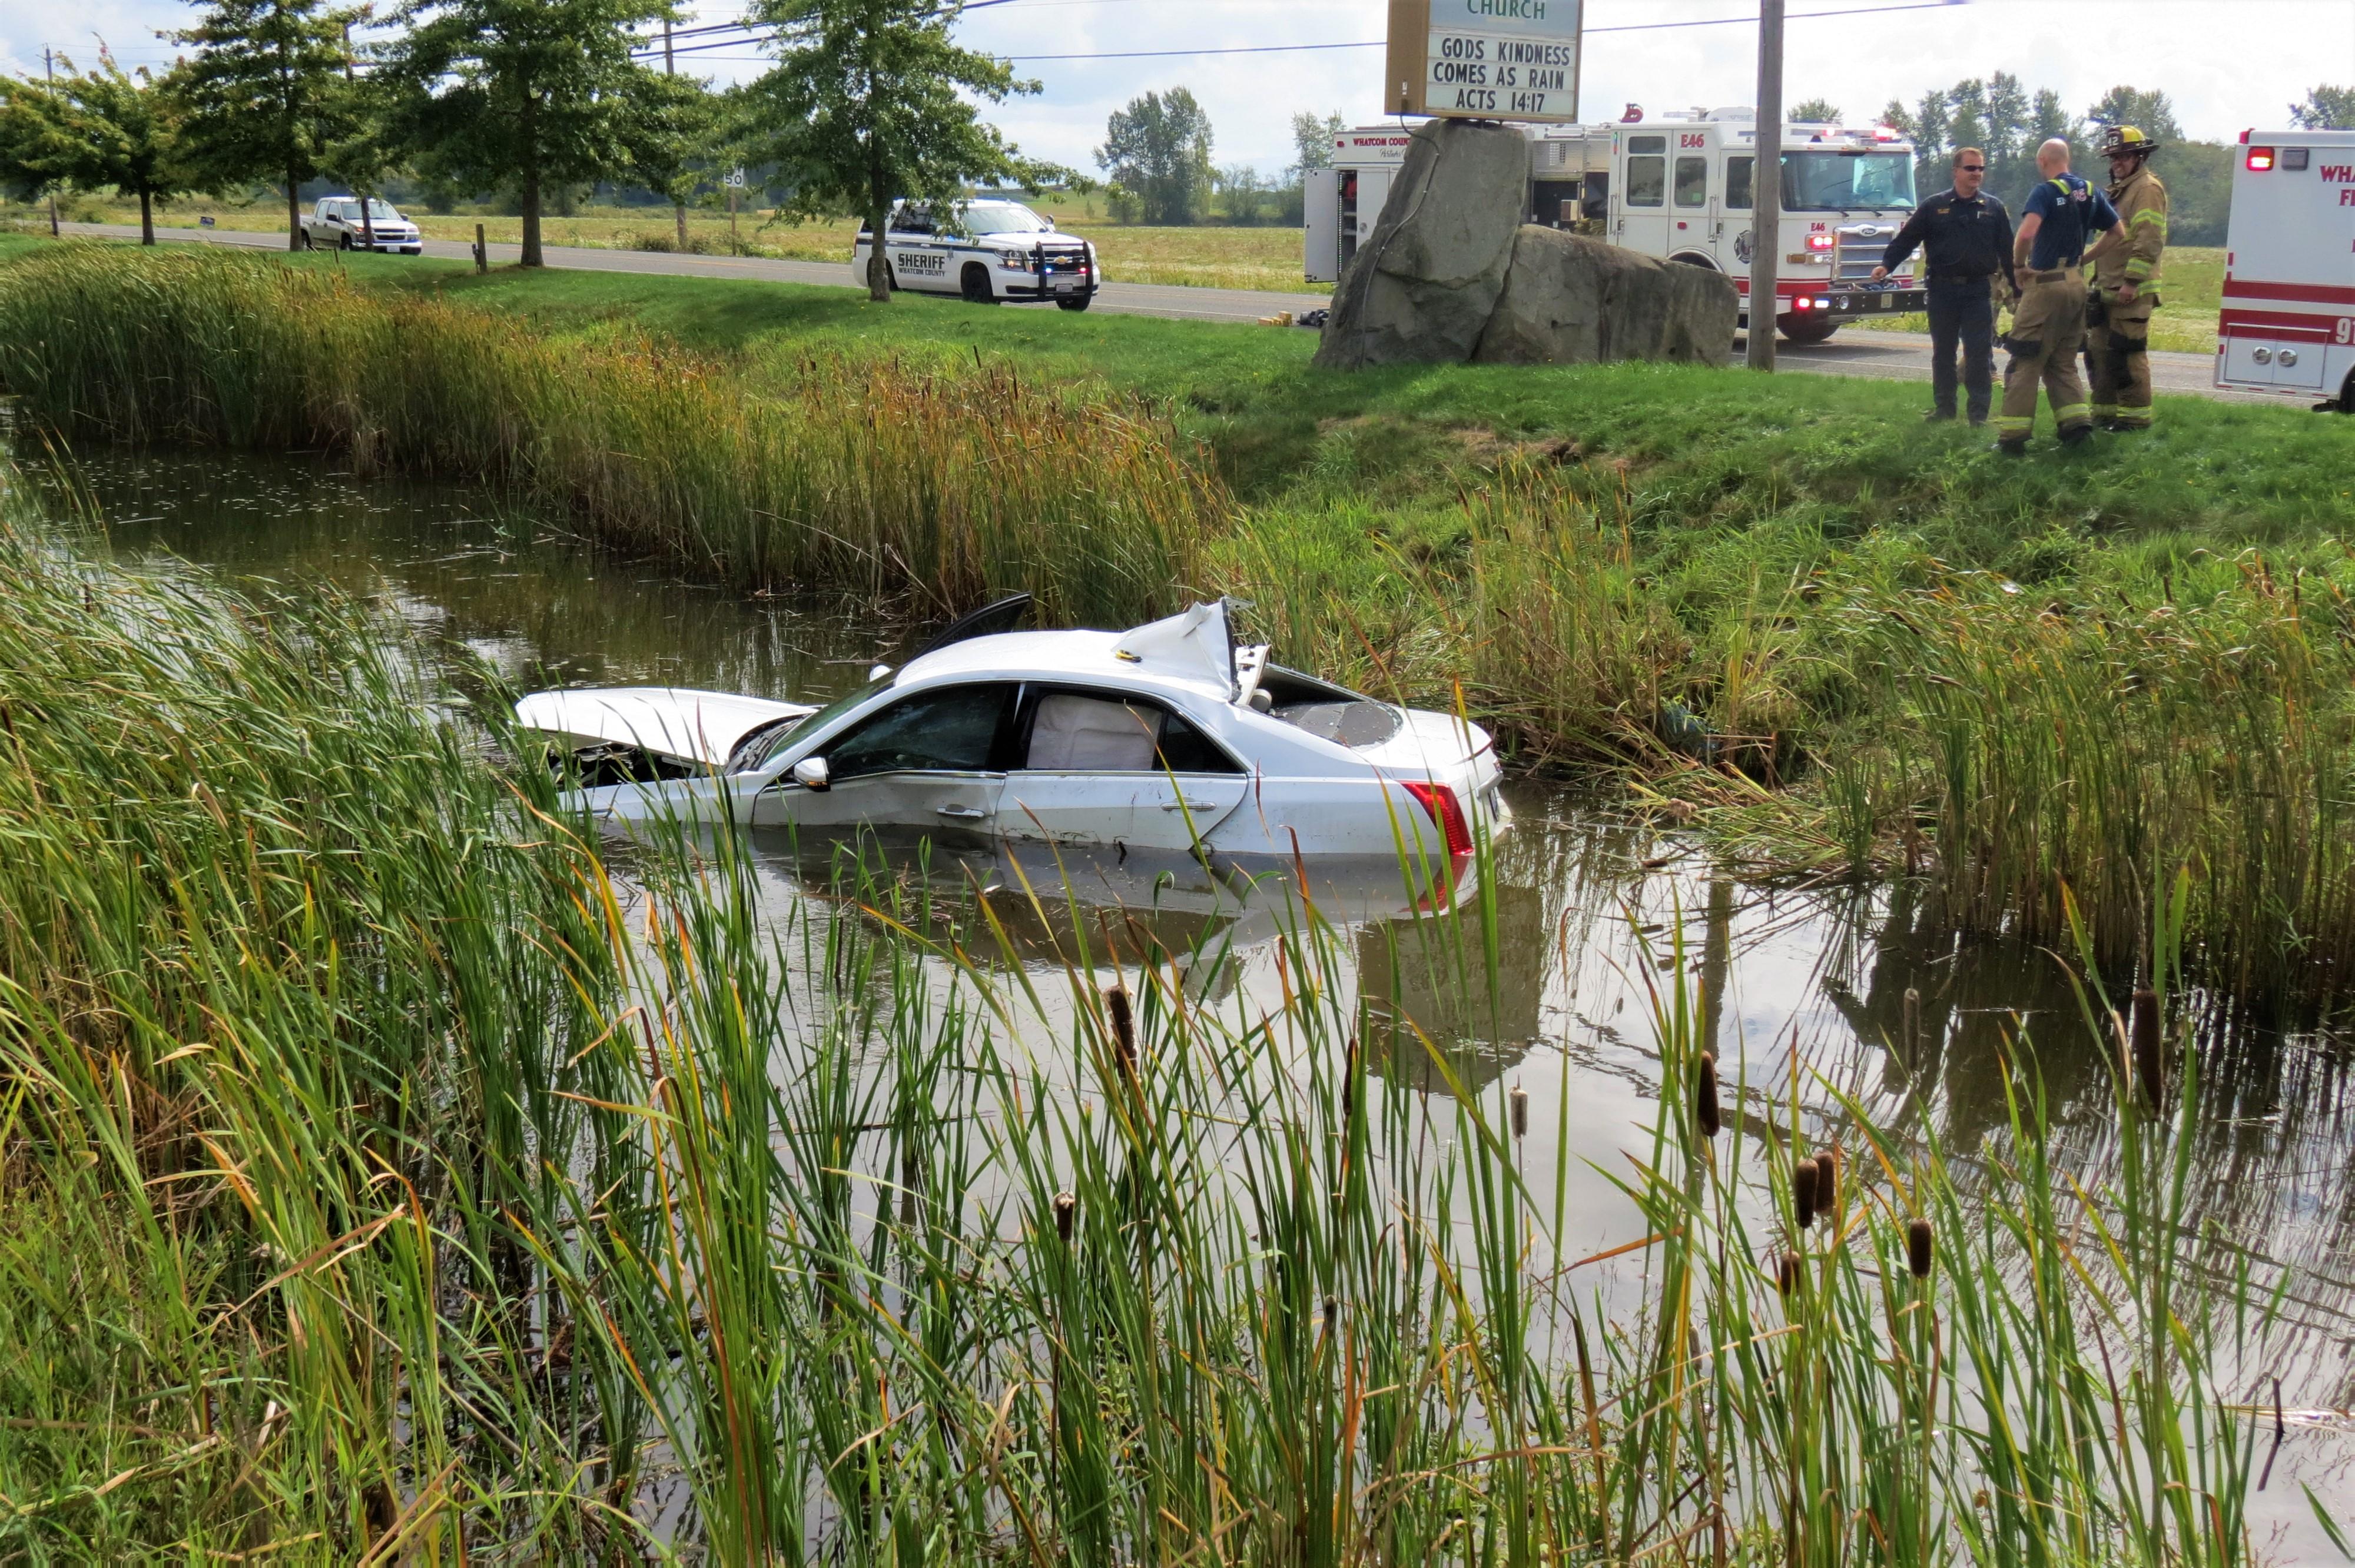 Scene of a T-bone crash at Mountain View and Olson Roads (September 20, 2021). Photo: Whatcom News